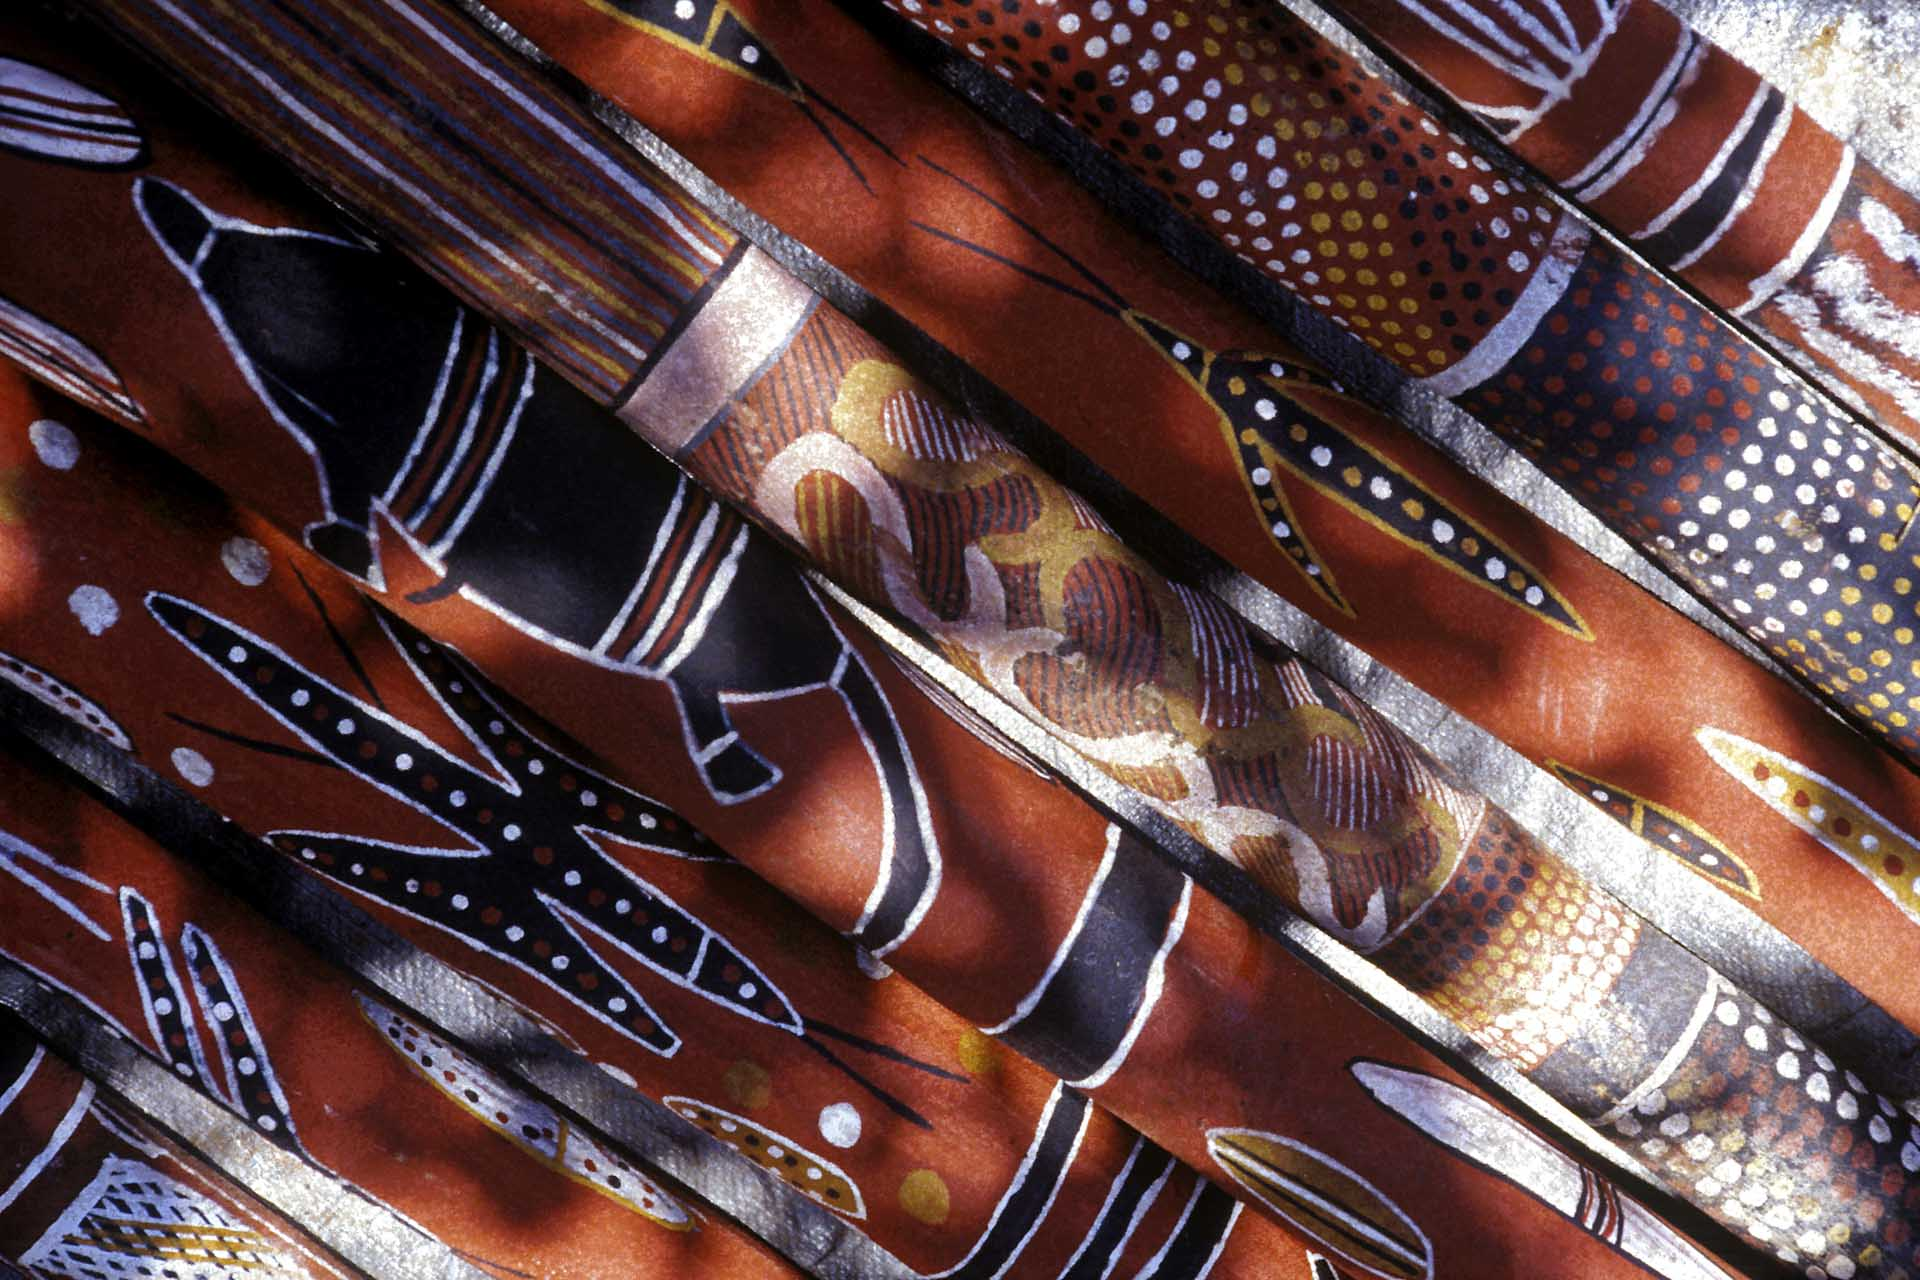 118855 Didgeridoors, Barrunga Festival, Barunga, NT